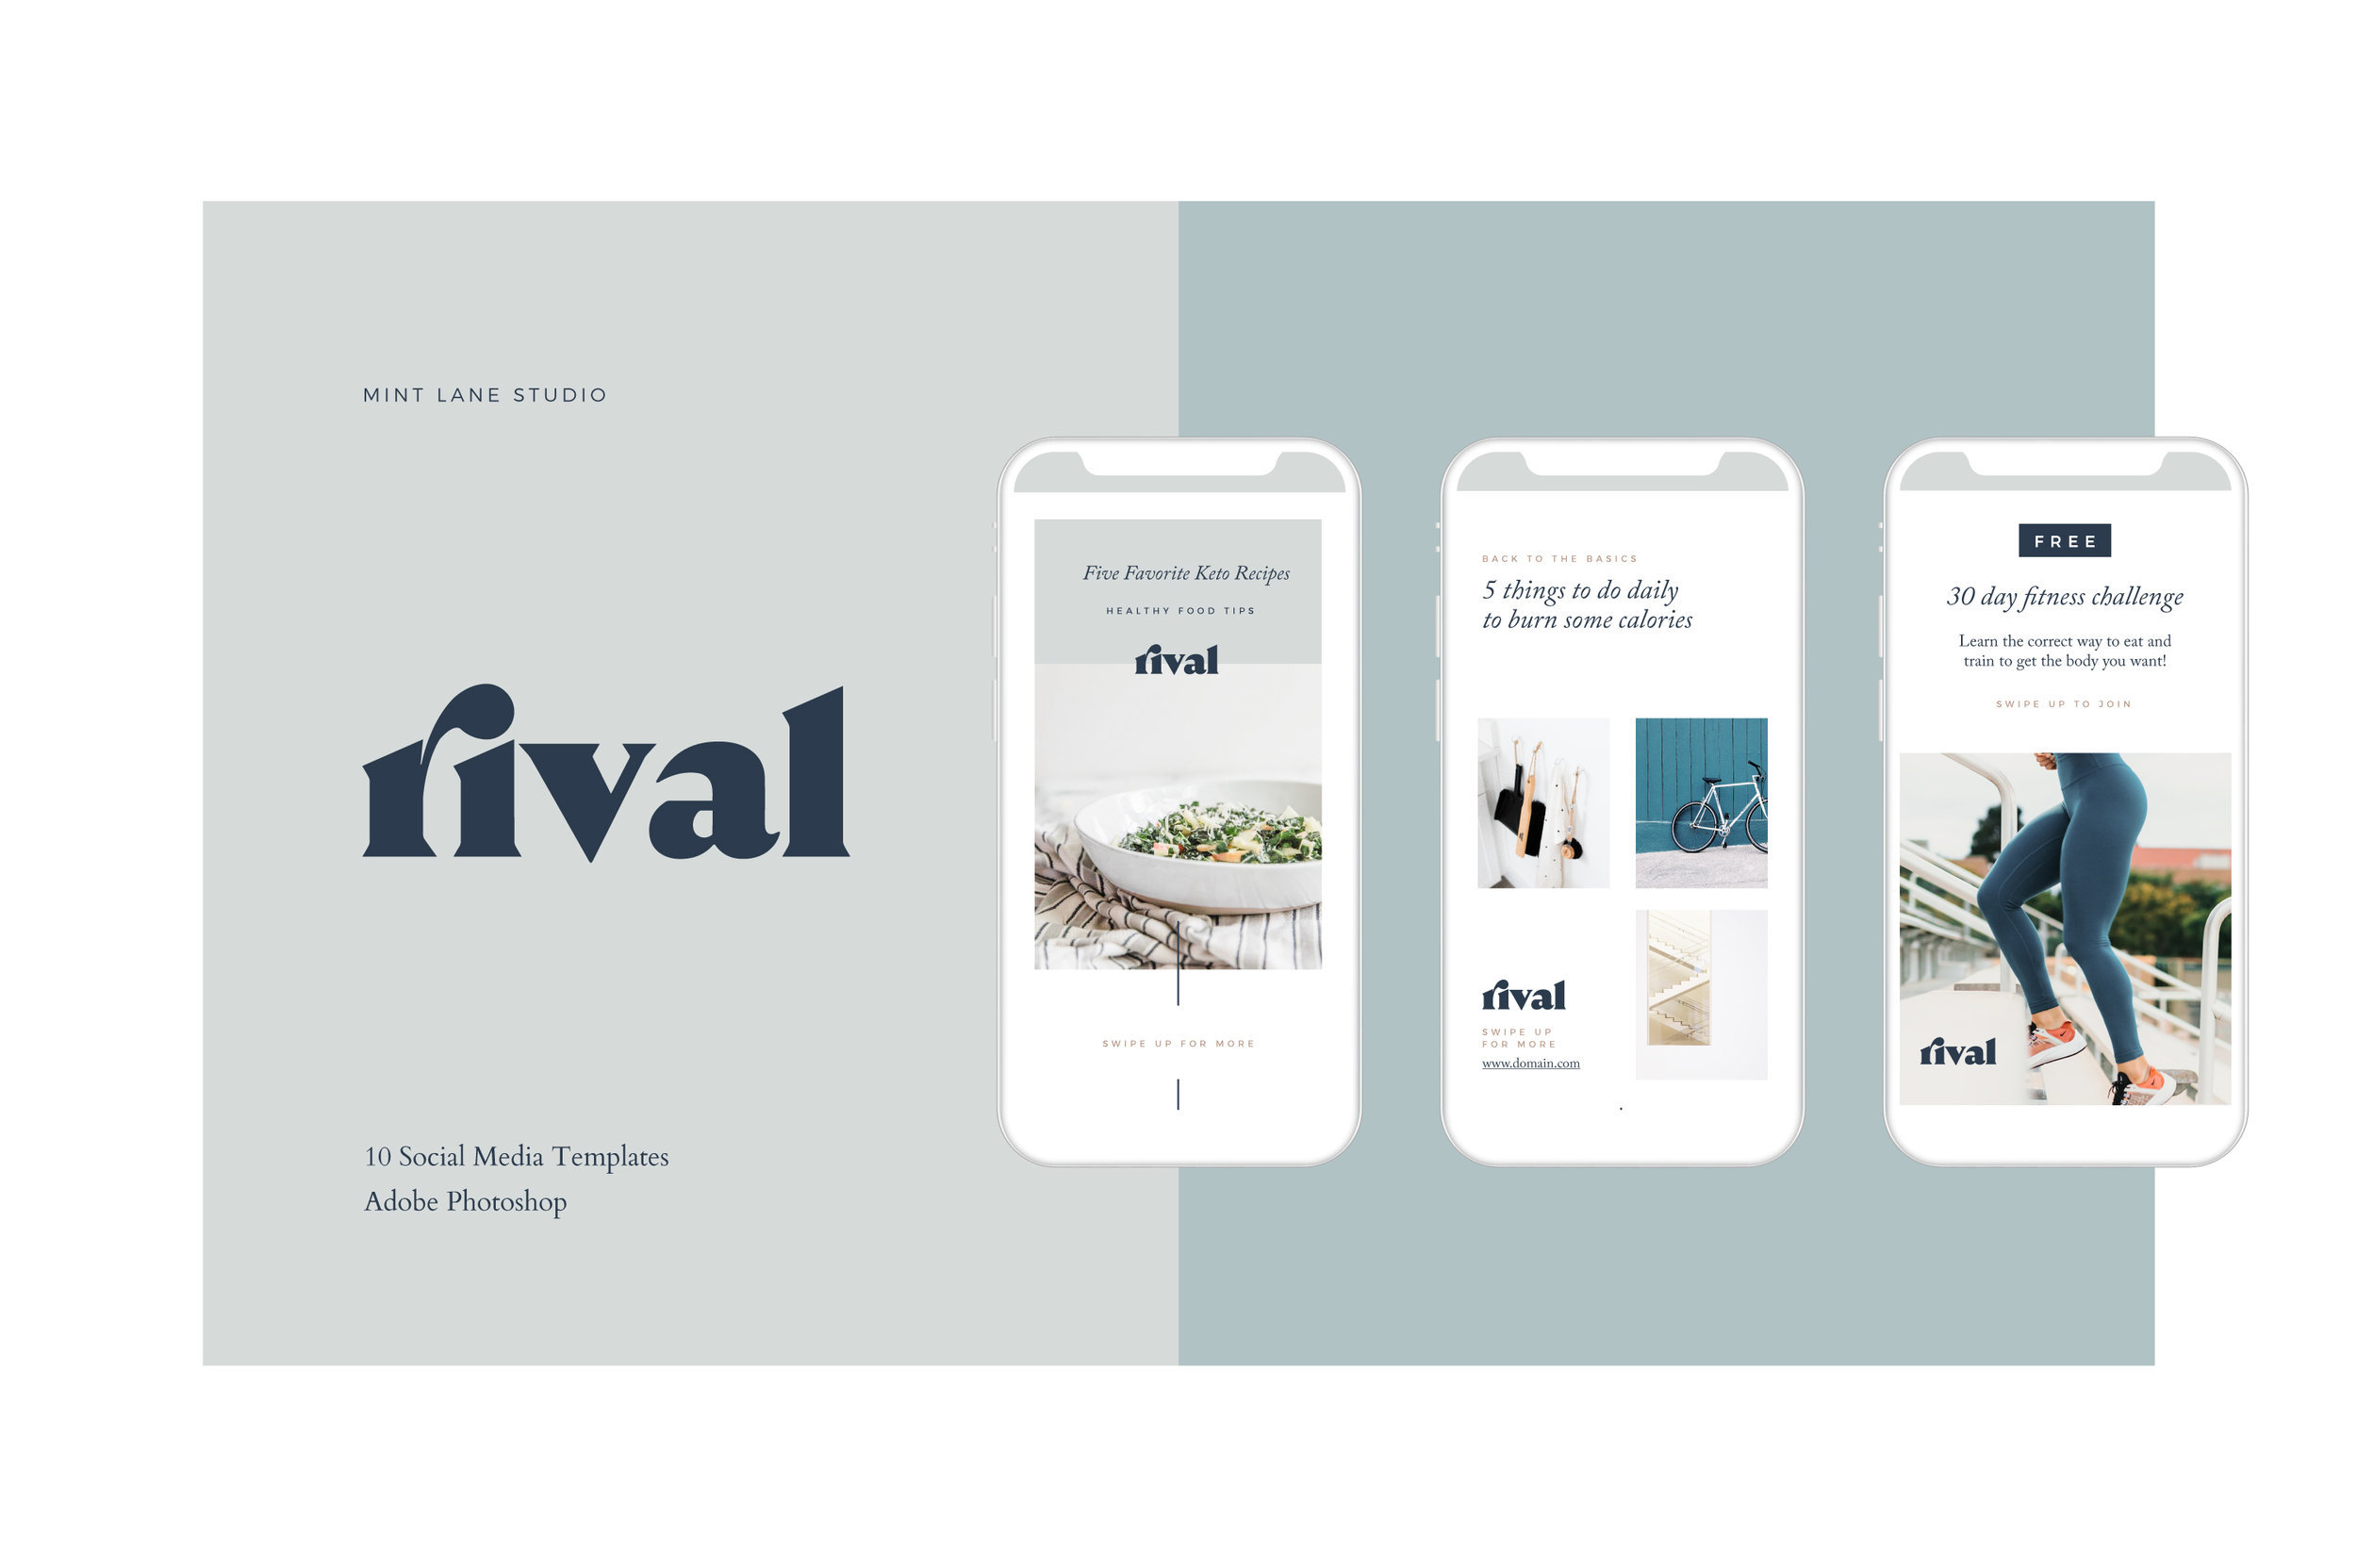 Rival-Insta-template-cover.jpg